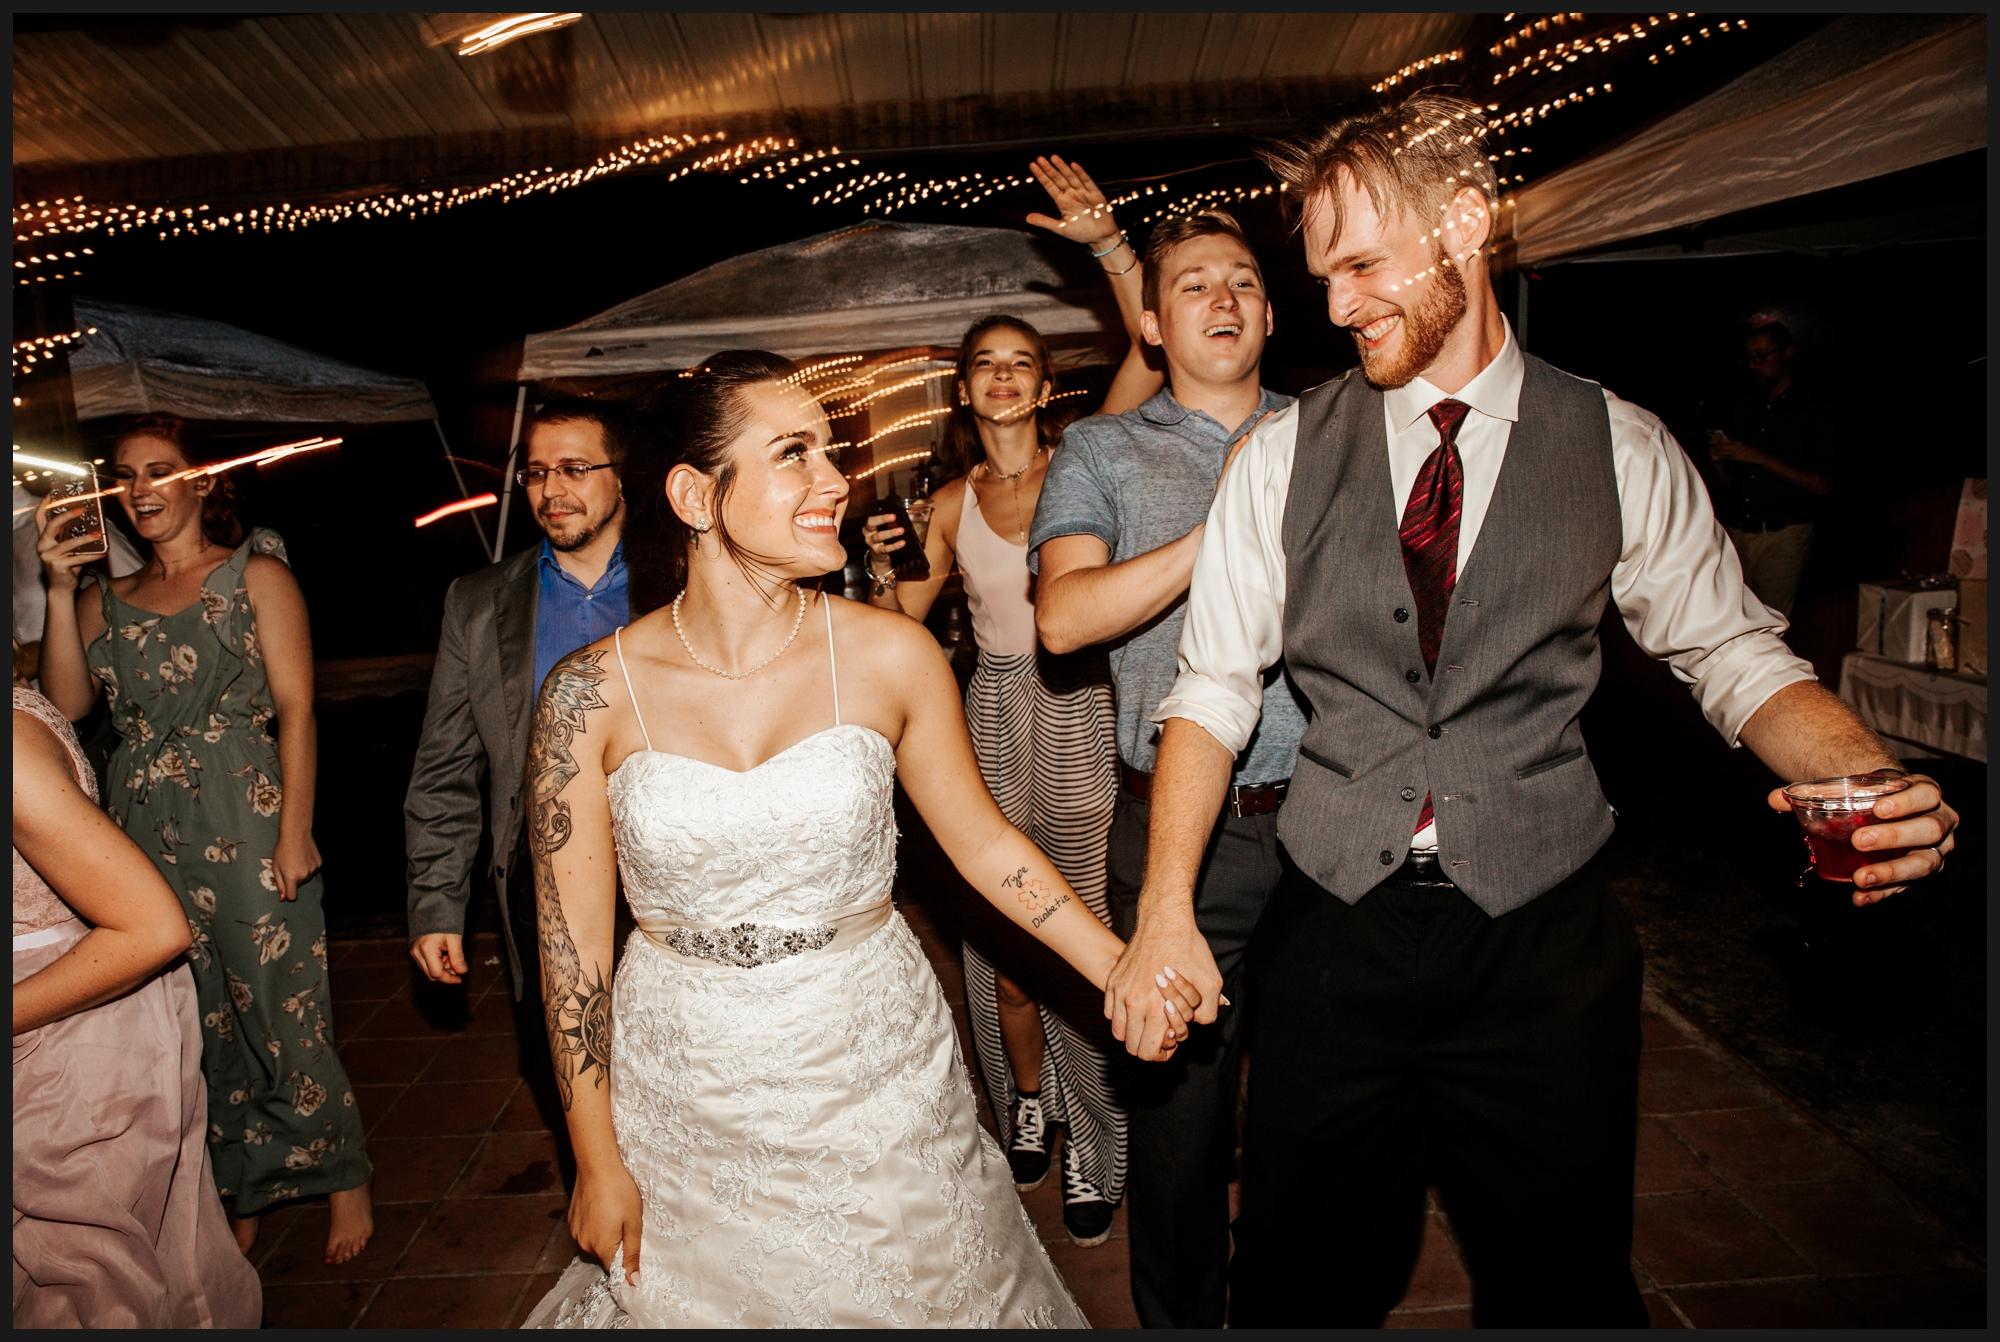 Orlando-Wedding-Photographer-destination-wedding-photographer-florida-wedding-photographer-bohemian-wedding-photographer_0379.jpg